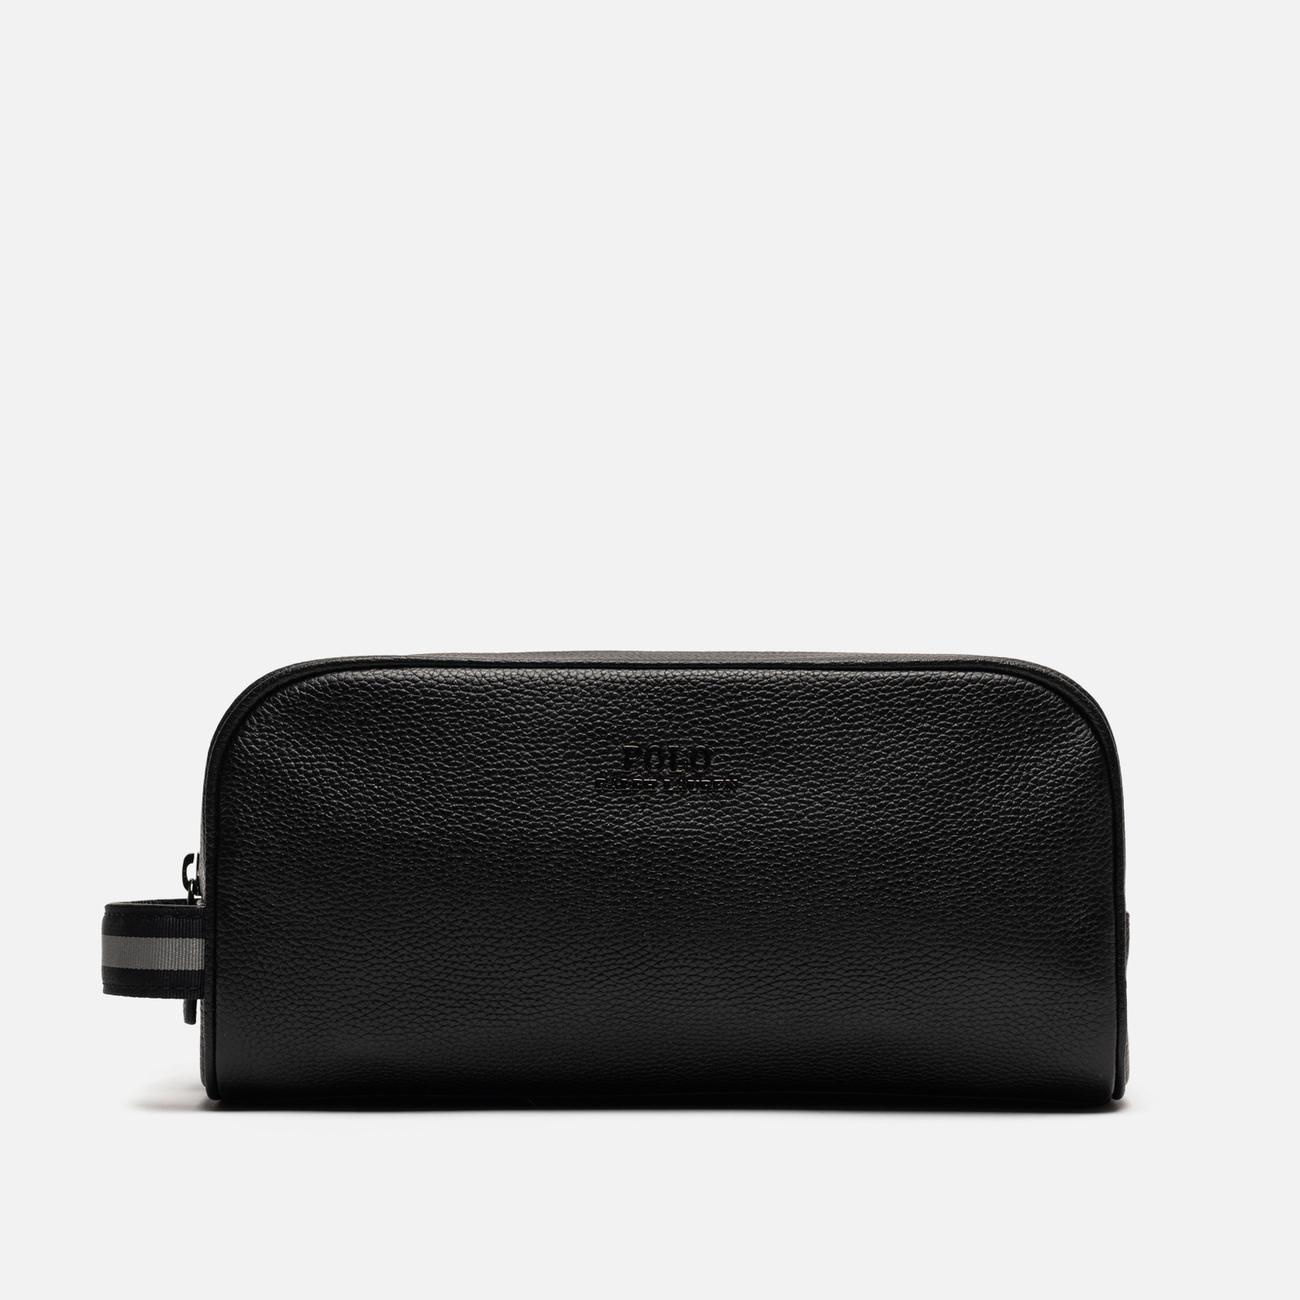 Косметичка Polo Ralph Lauren Tailored Pebble Leather Travel Small Black